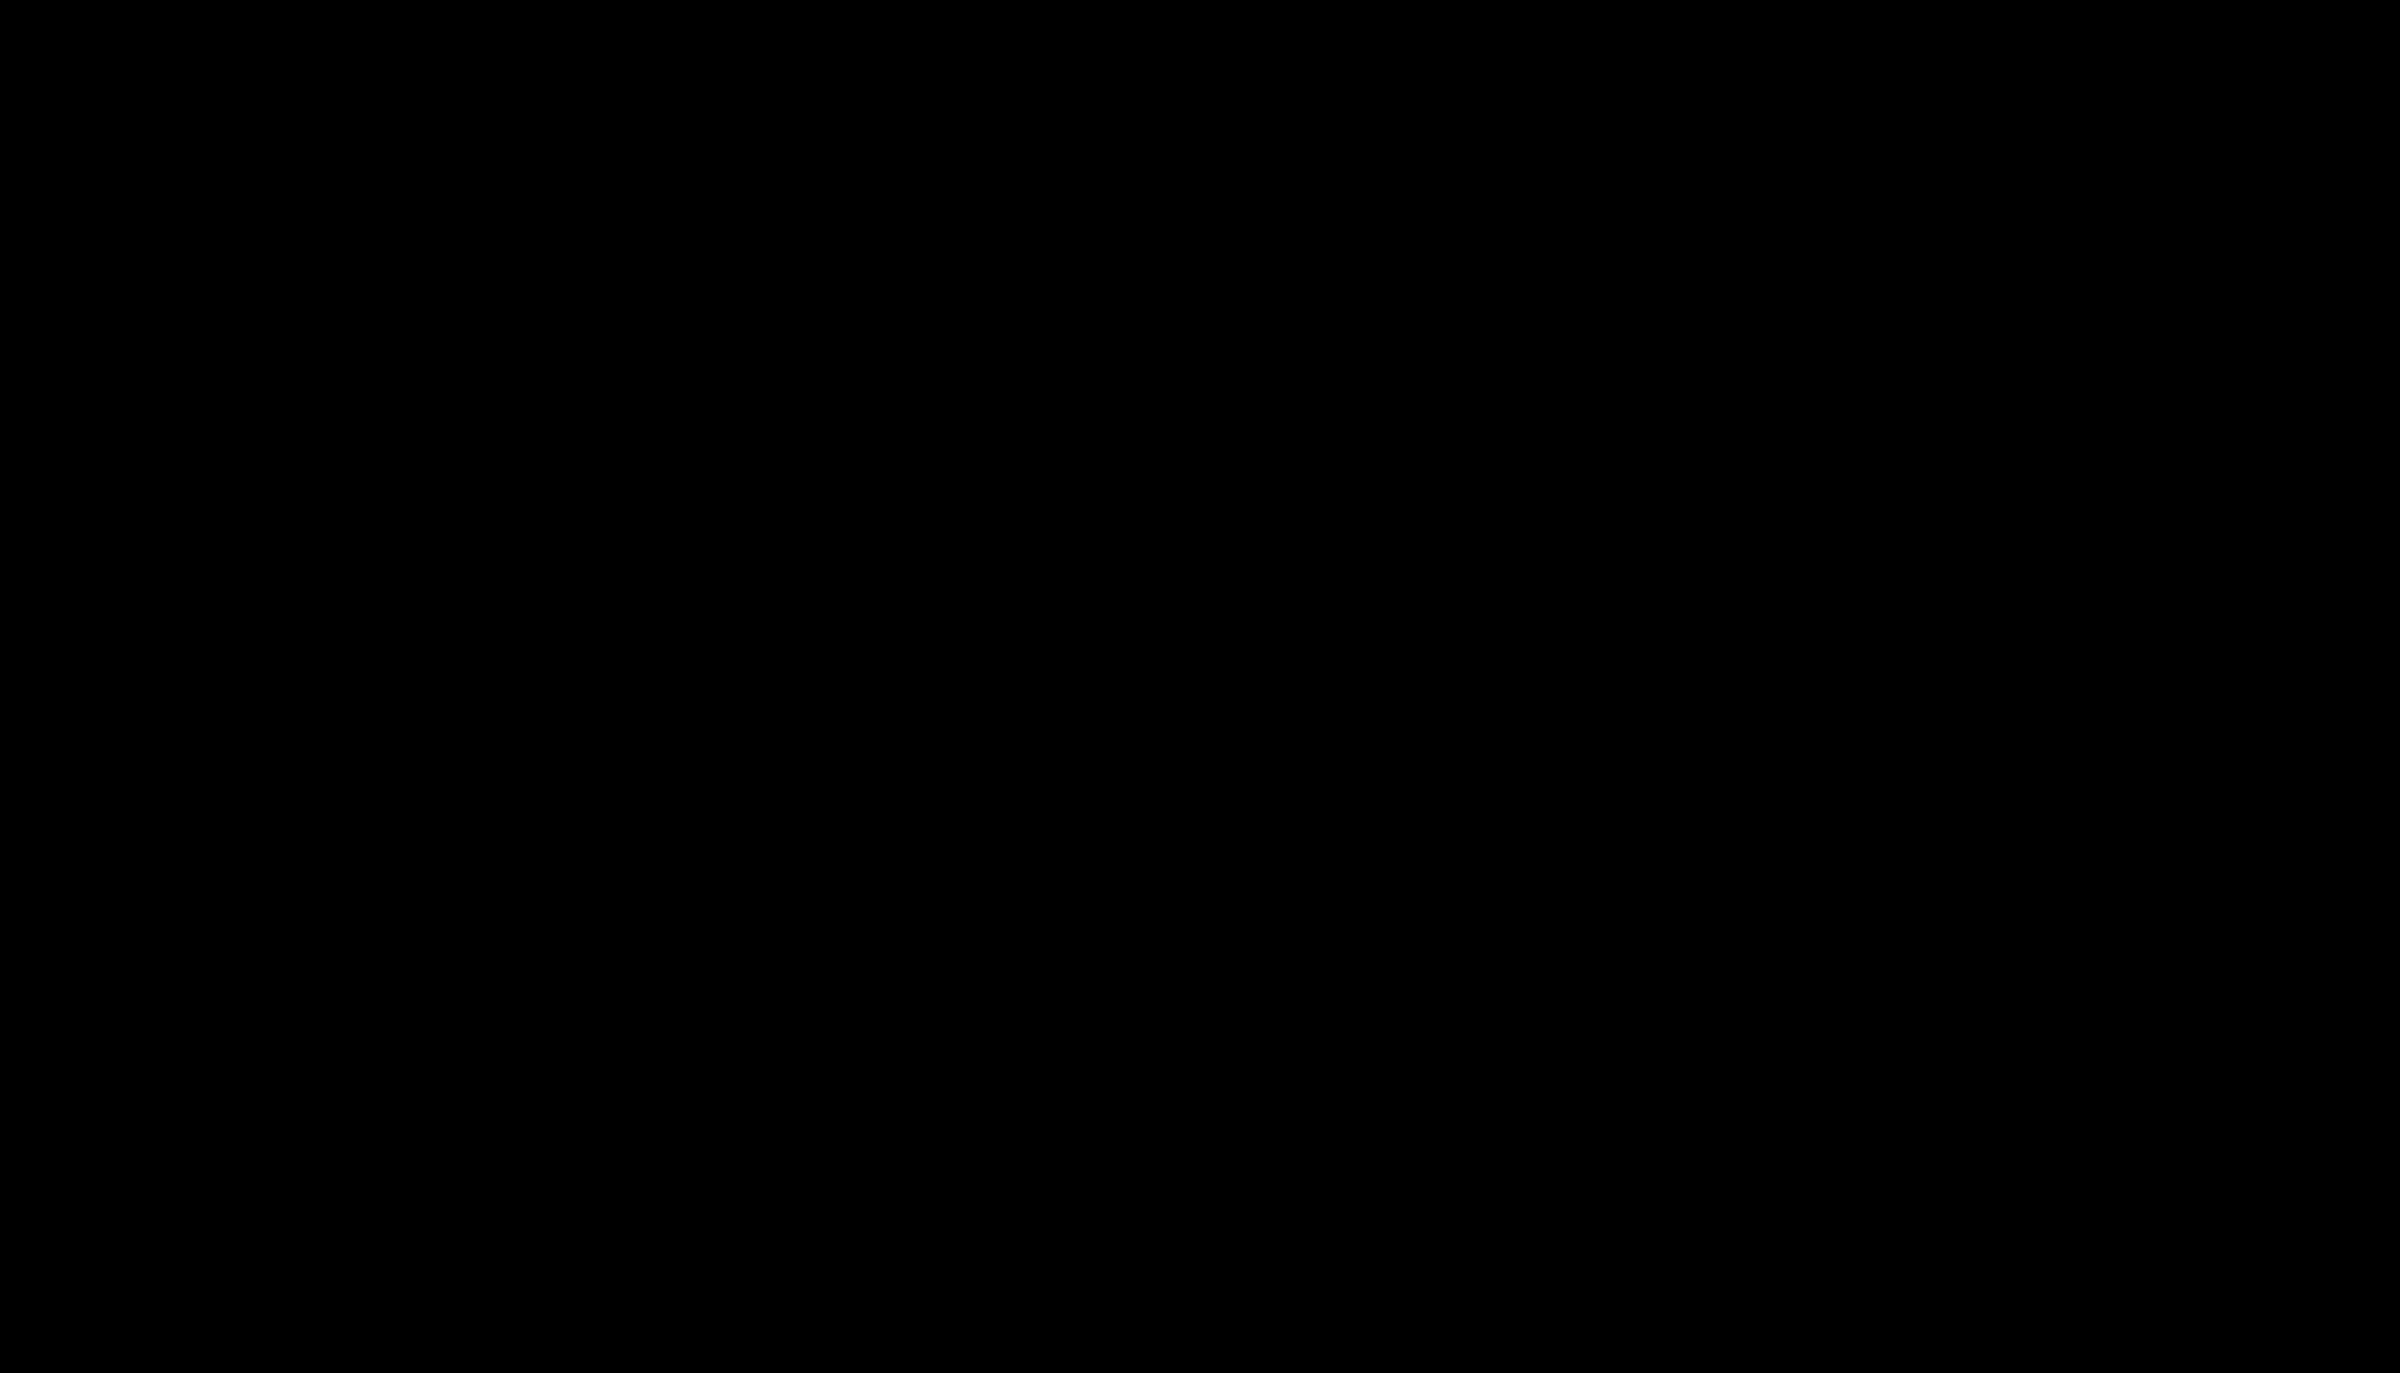 public-broadcasting-service-logo-png-transparent.png